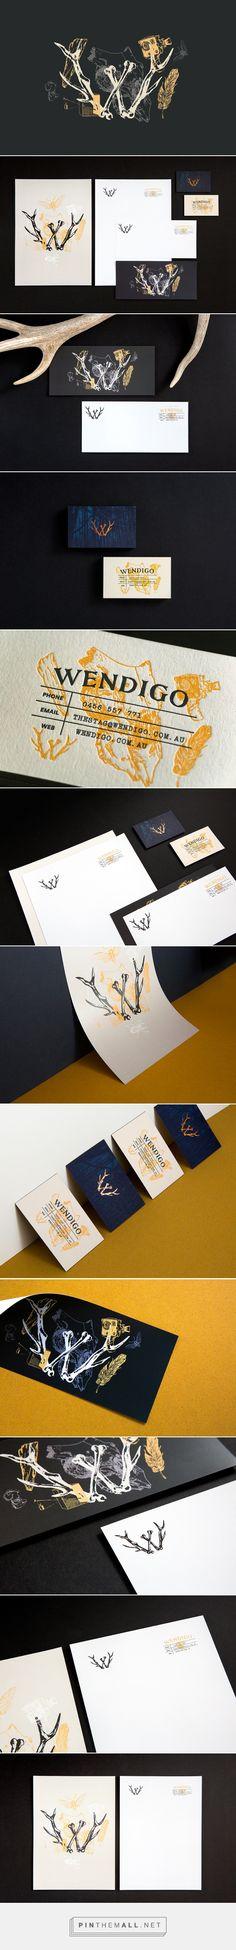 Wendigo on Behance | Fivestar Branding – Design and Branding Agency & Inspiration Gallery